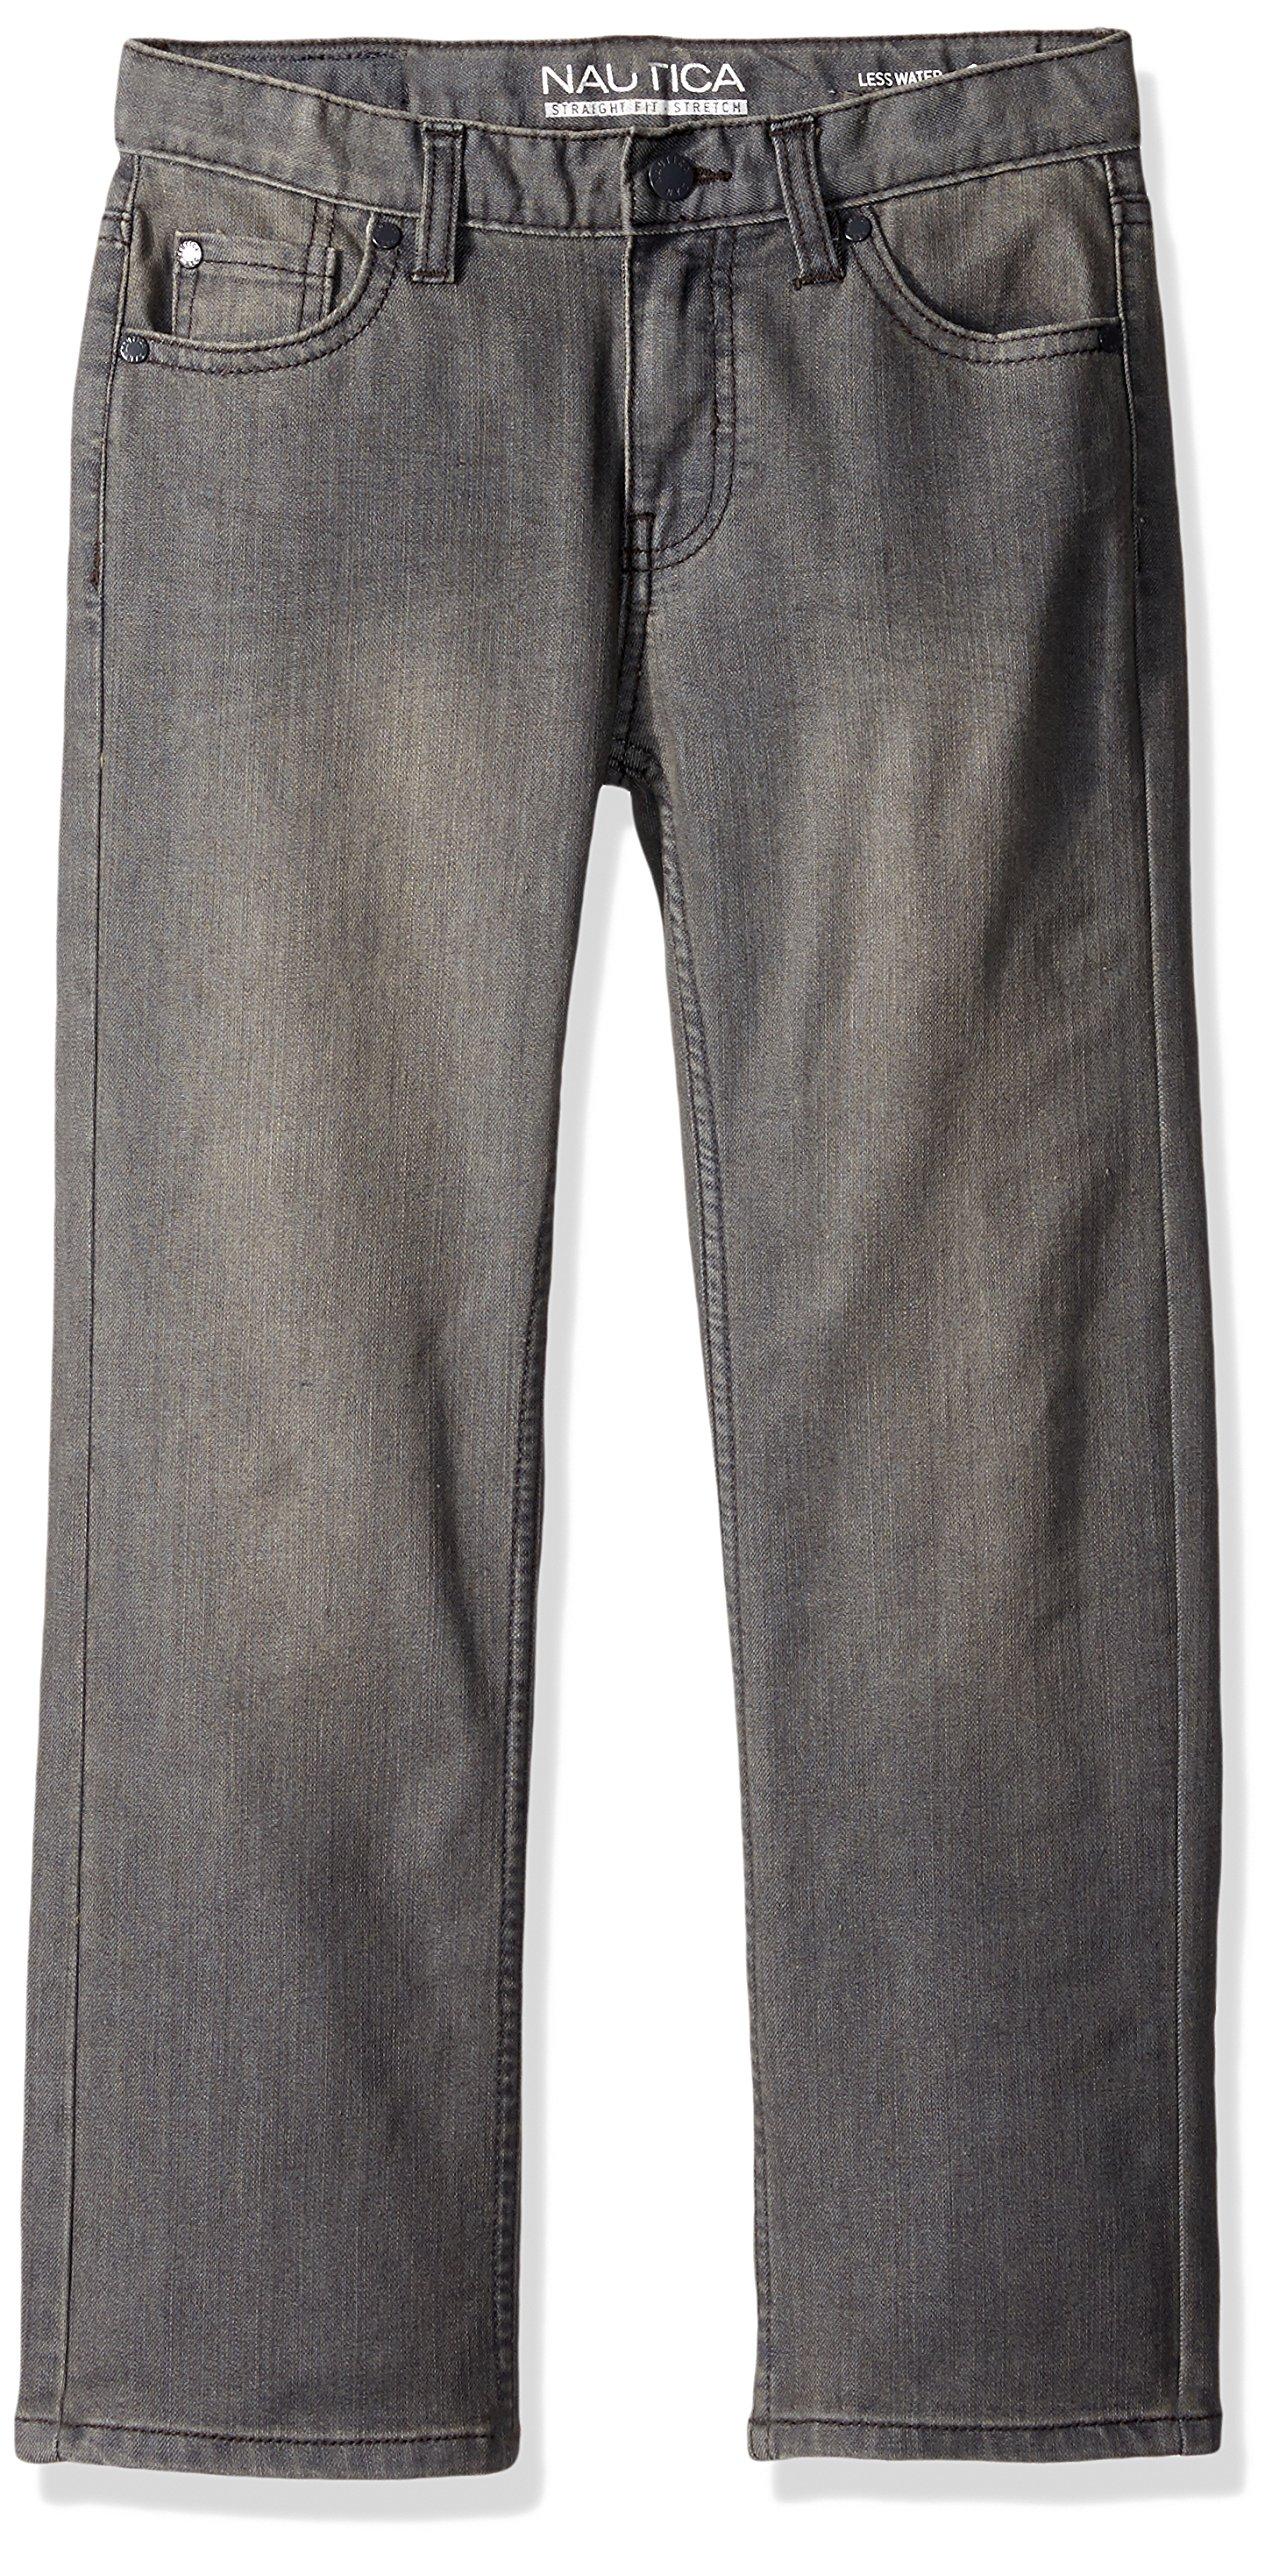 Nautica Big Boys' 5-Pocket Straight Fit Jeans, Shale/Stretch, 14